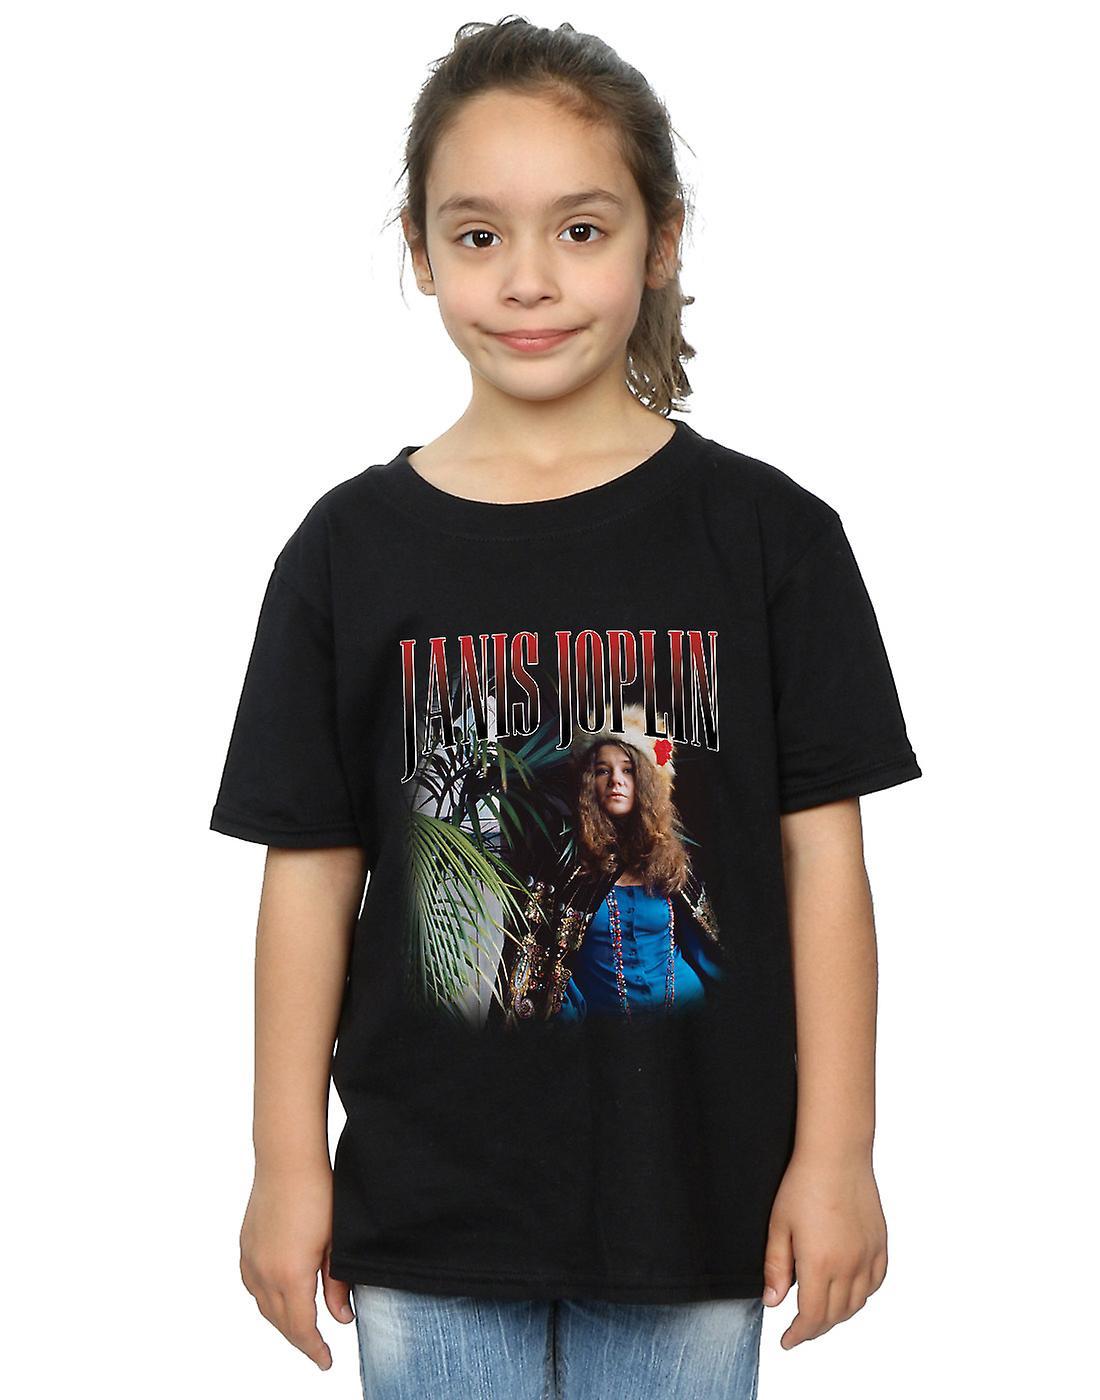 Janis Joplin ragazze Baron omaggio t-shirt